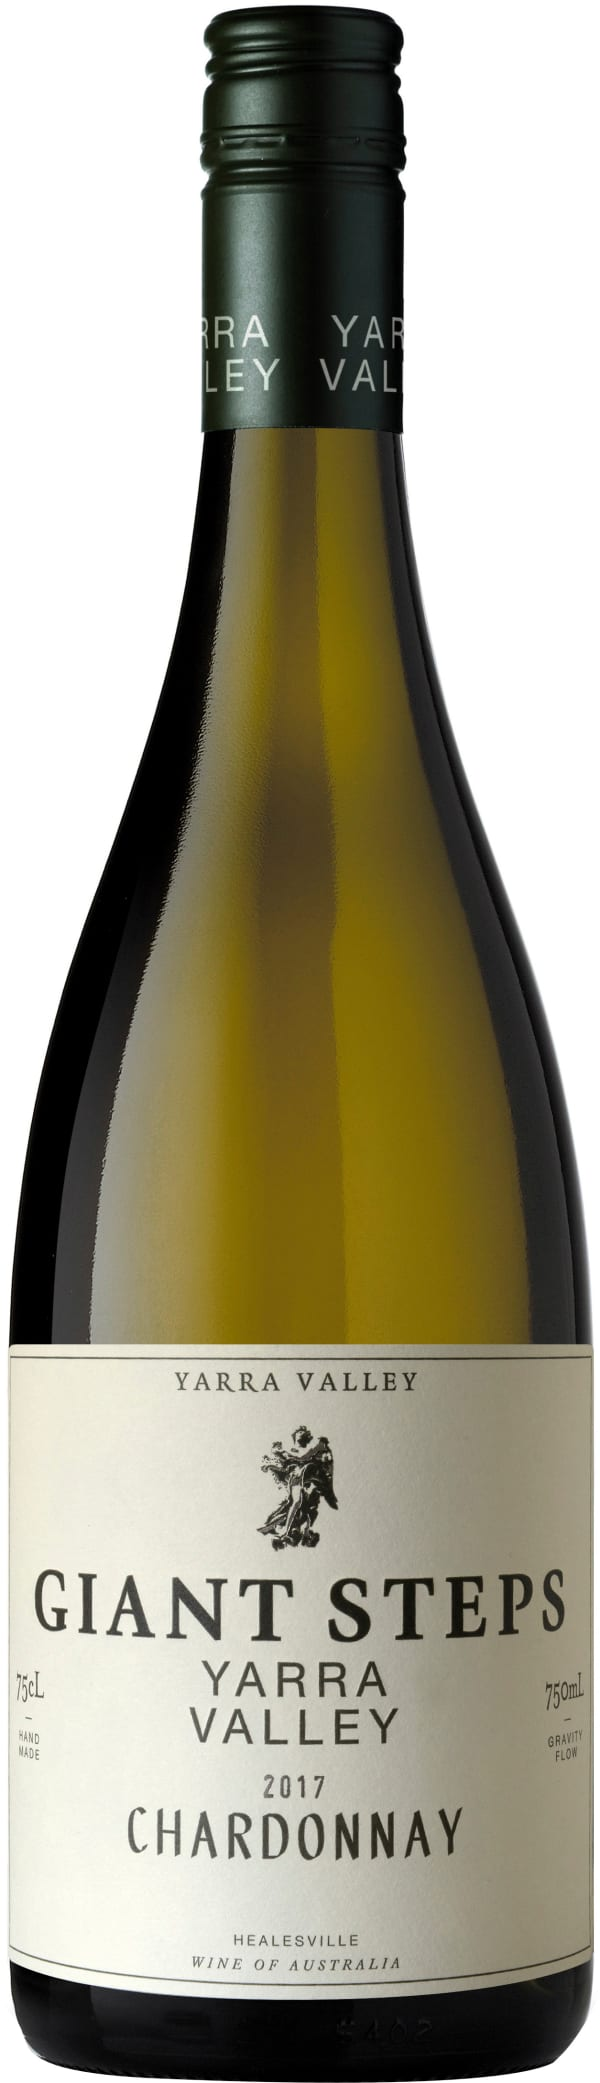 Giant Steps Chardonnay 2017